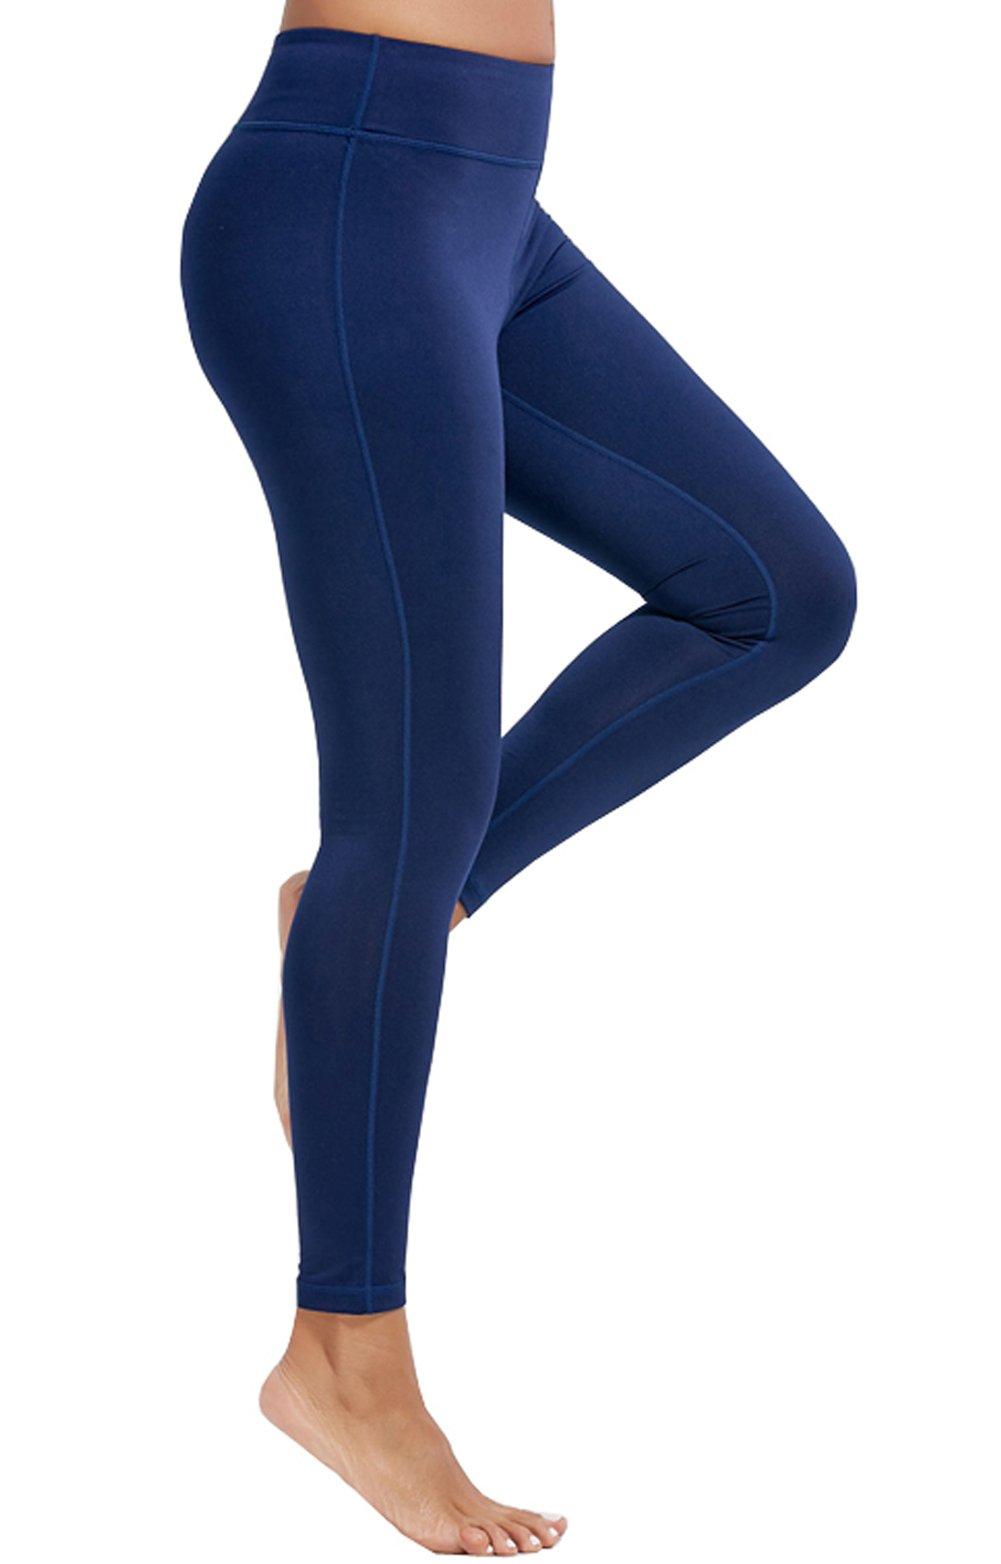 e657bfa326c26 Olacia Womens High Waisted Workout Leggings Running Pants Tummy ...